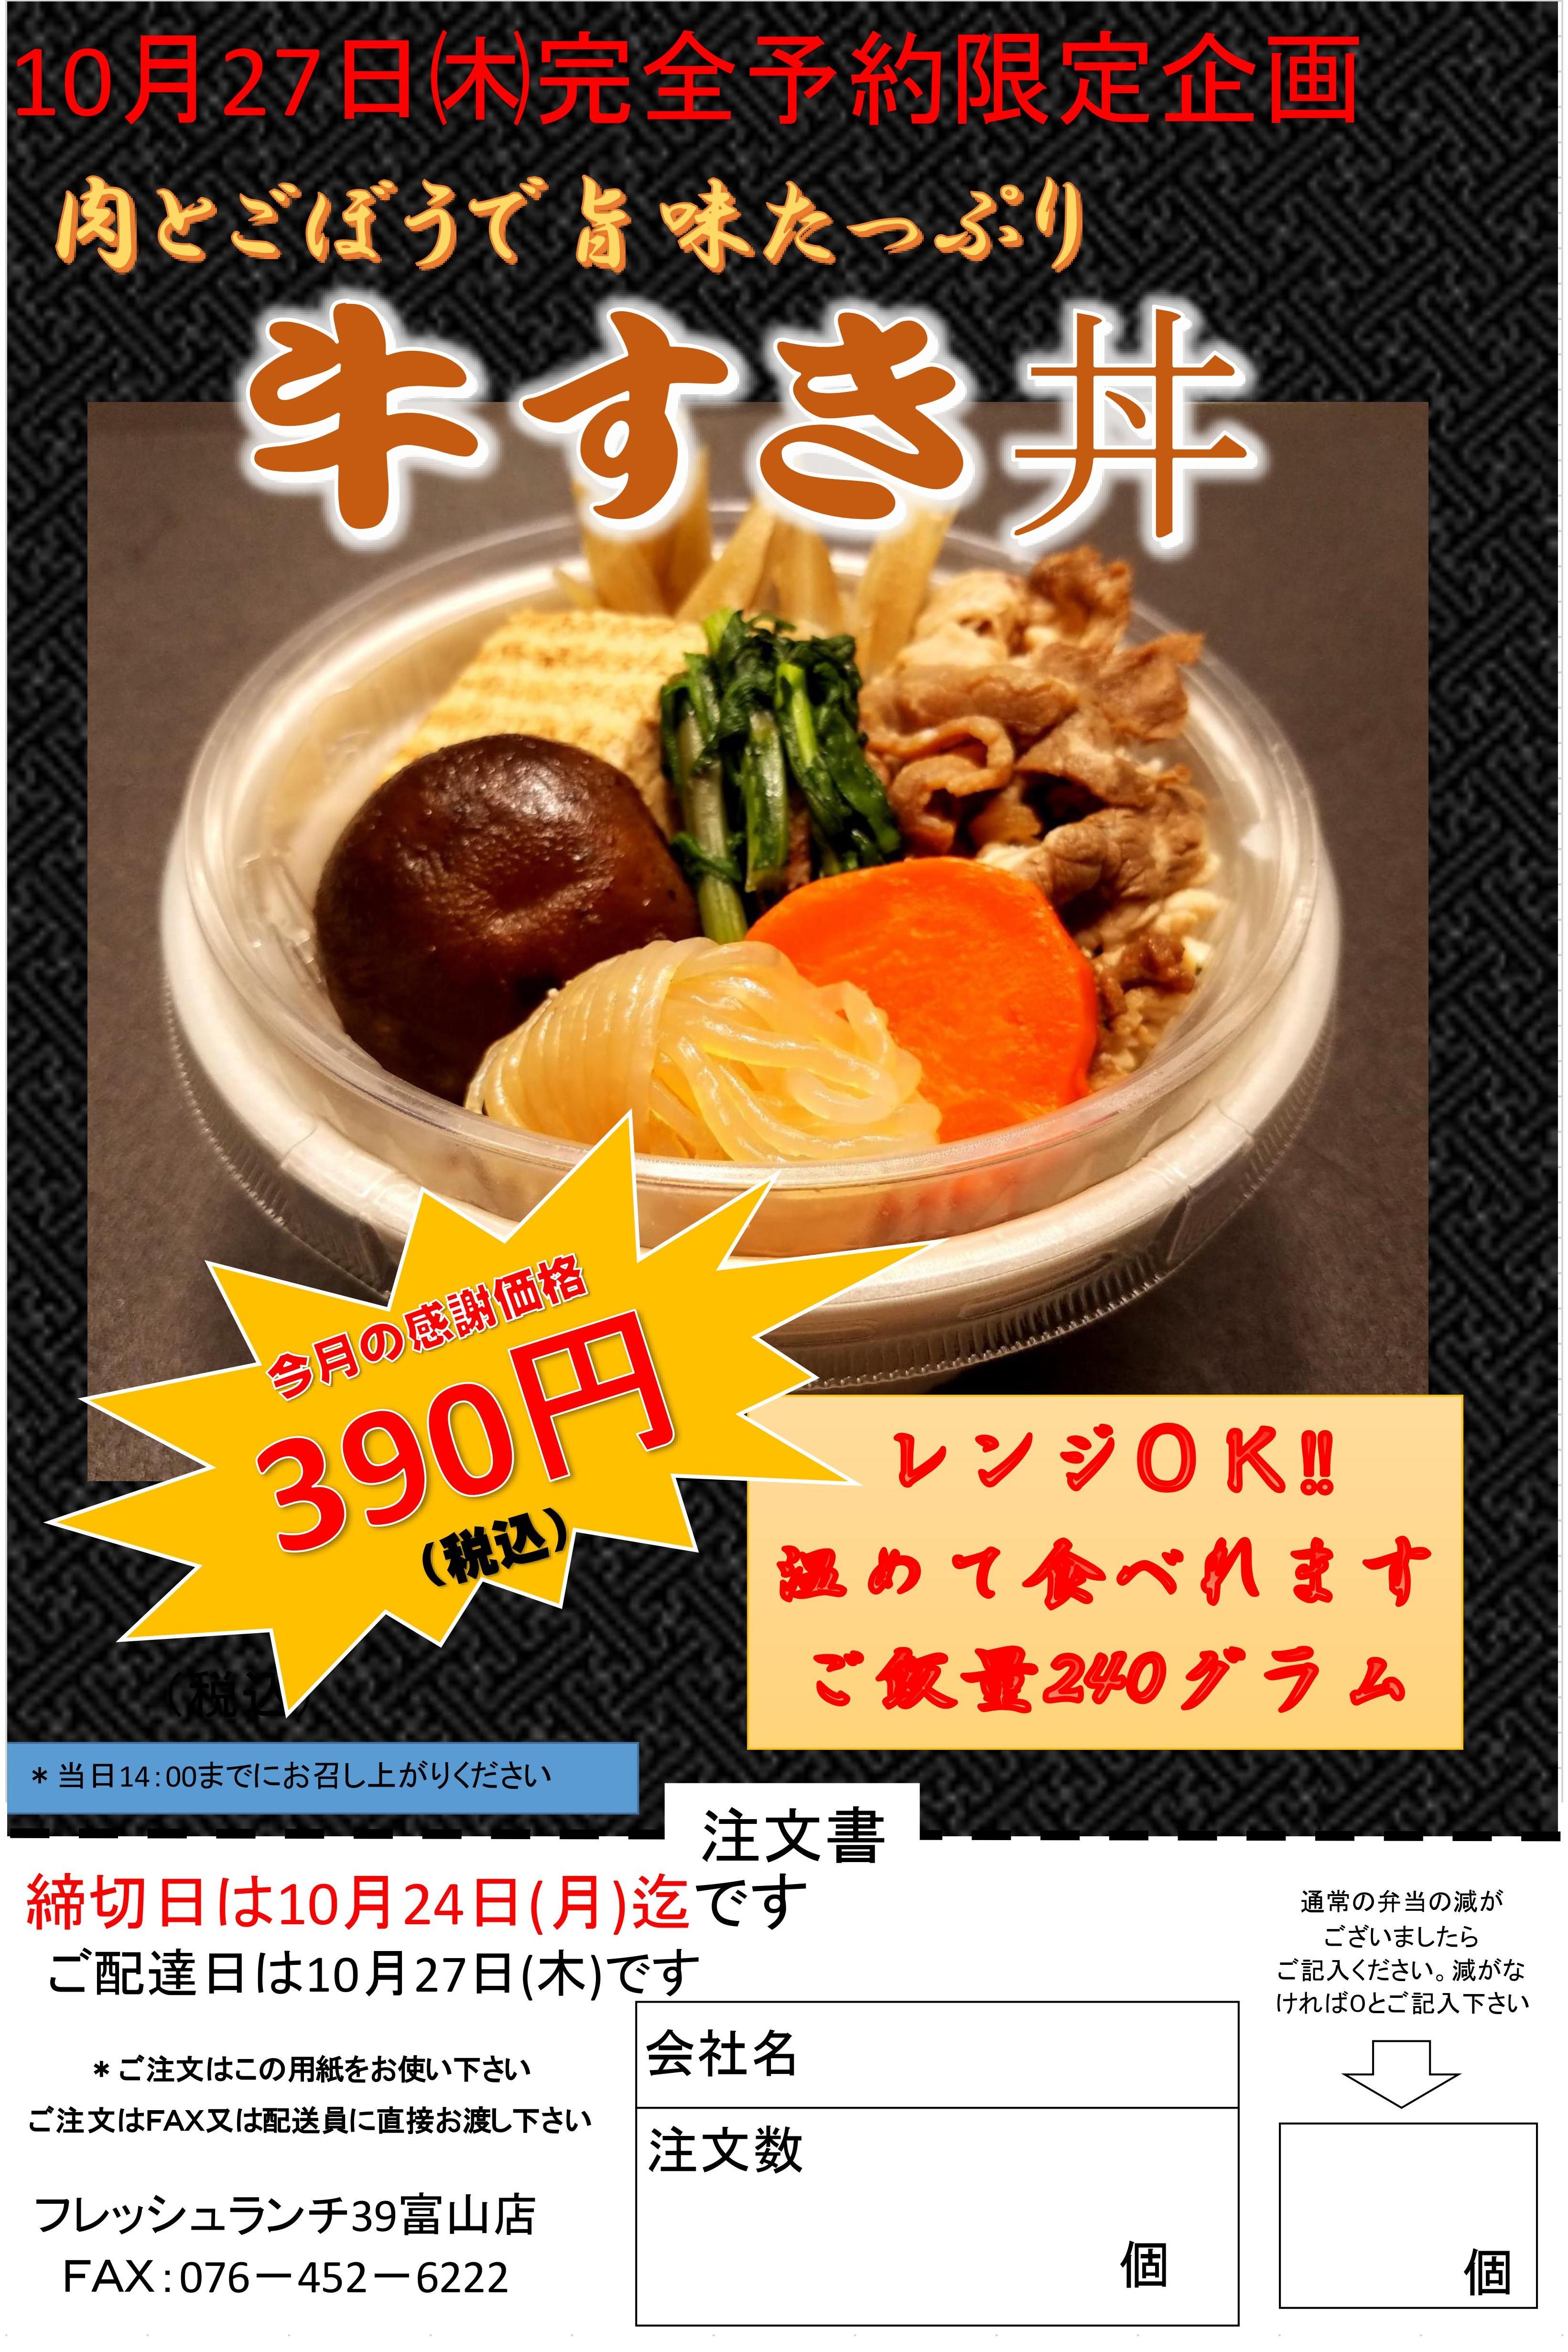 『牛すき丼』10月27(木)完全予約限定企画